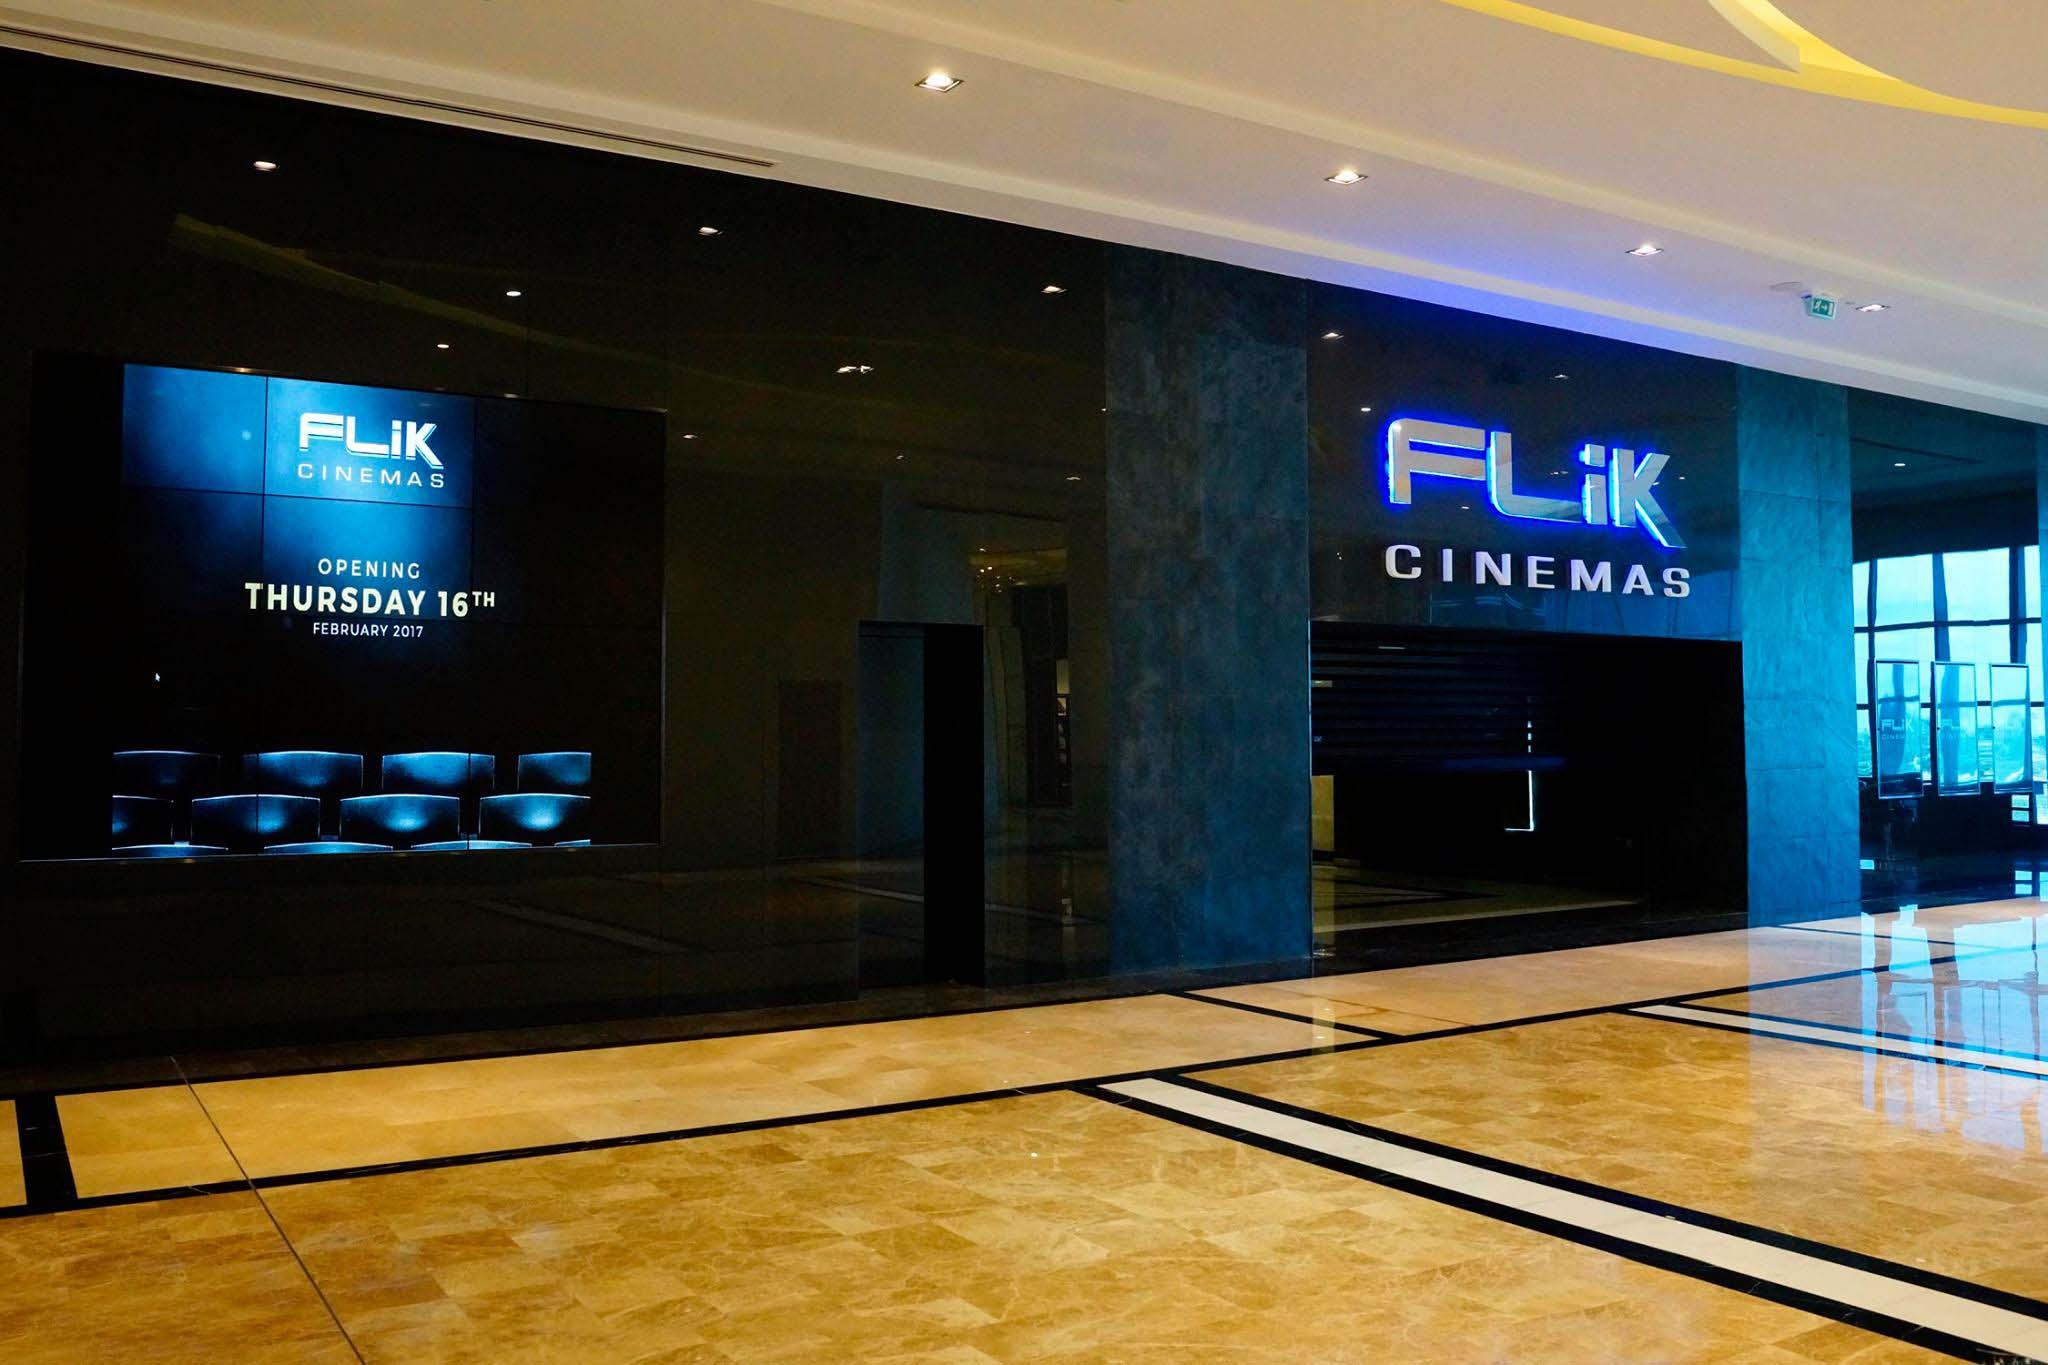 Flik Cinema at Lagoona Mall